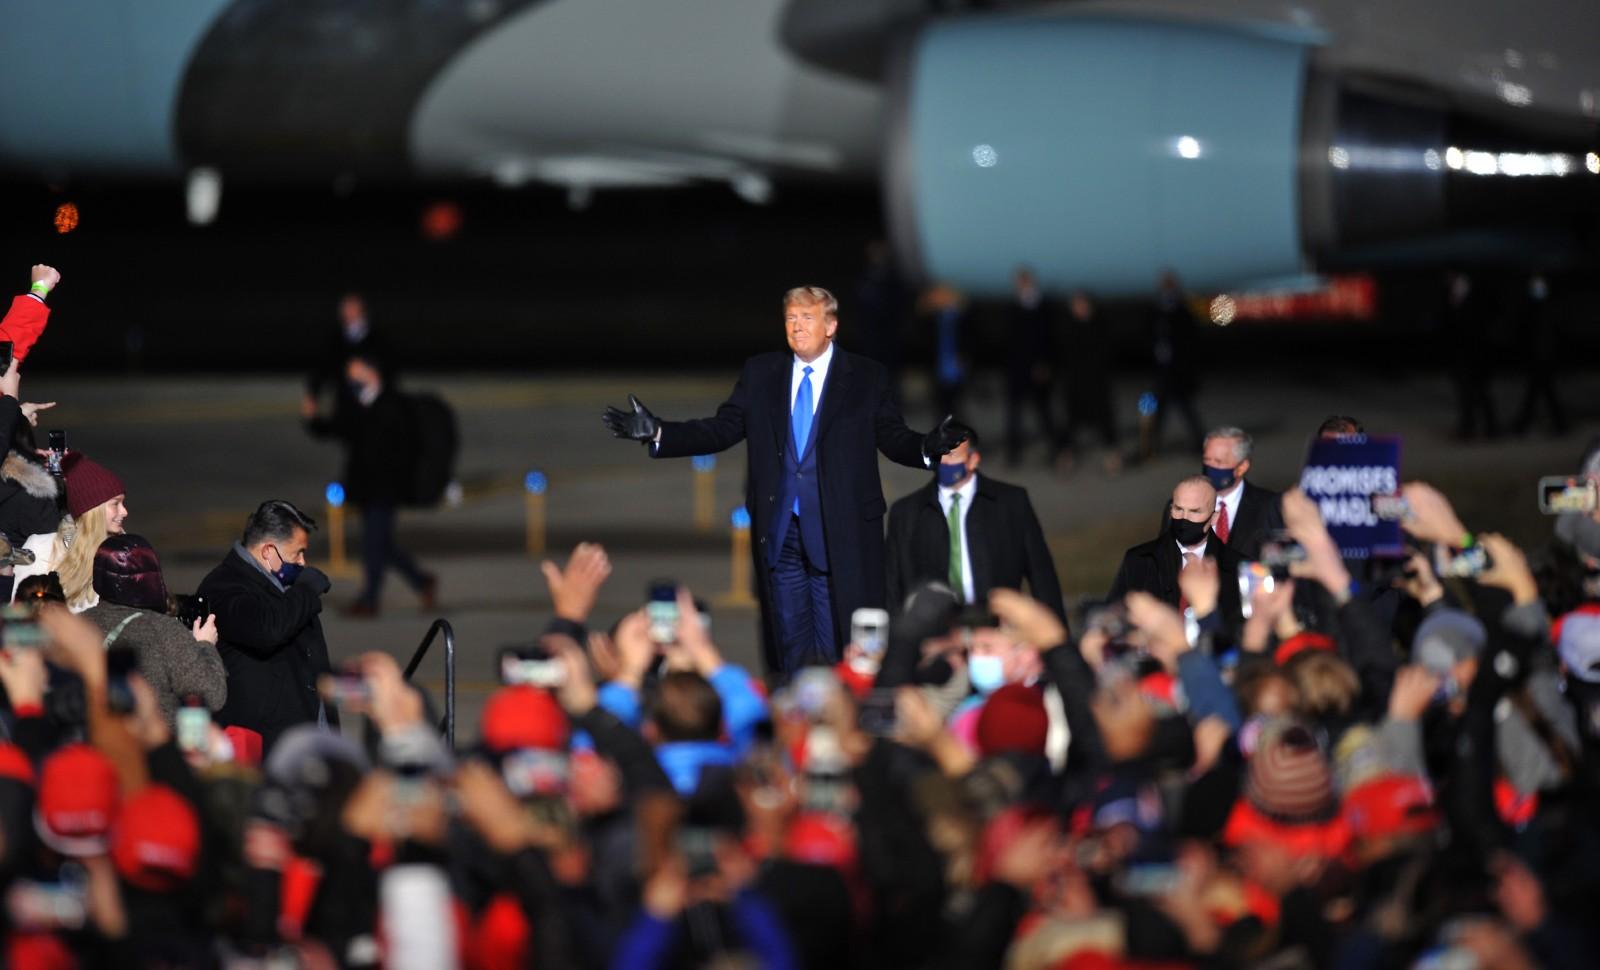 Donald Trump en meeting à Omaha (Nebraska), 27 octobre 2020. © Steve Pope/Getty Images/AFP.